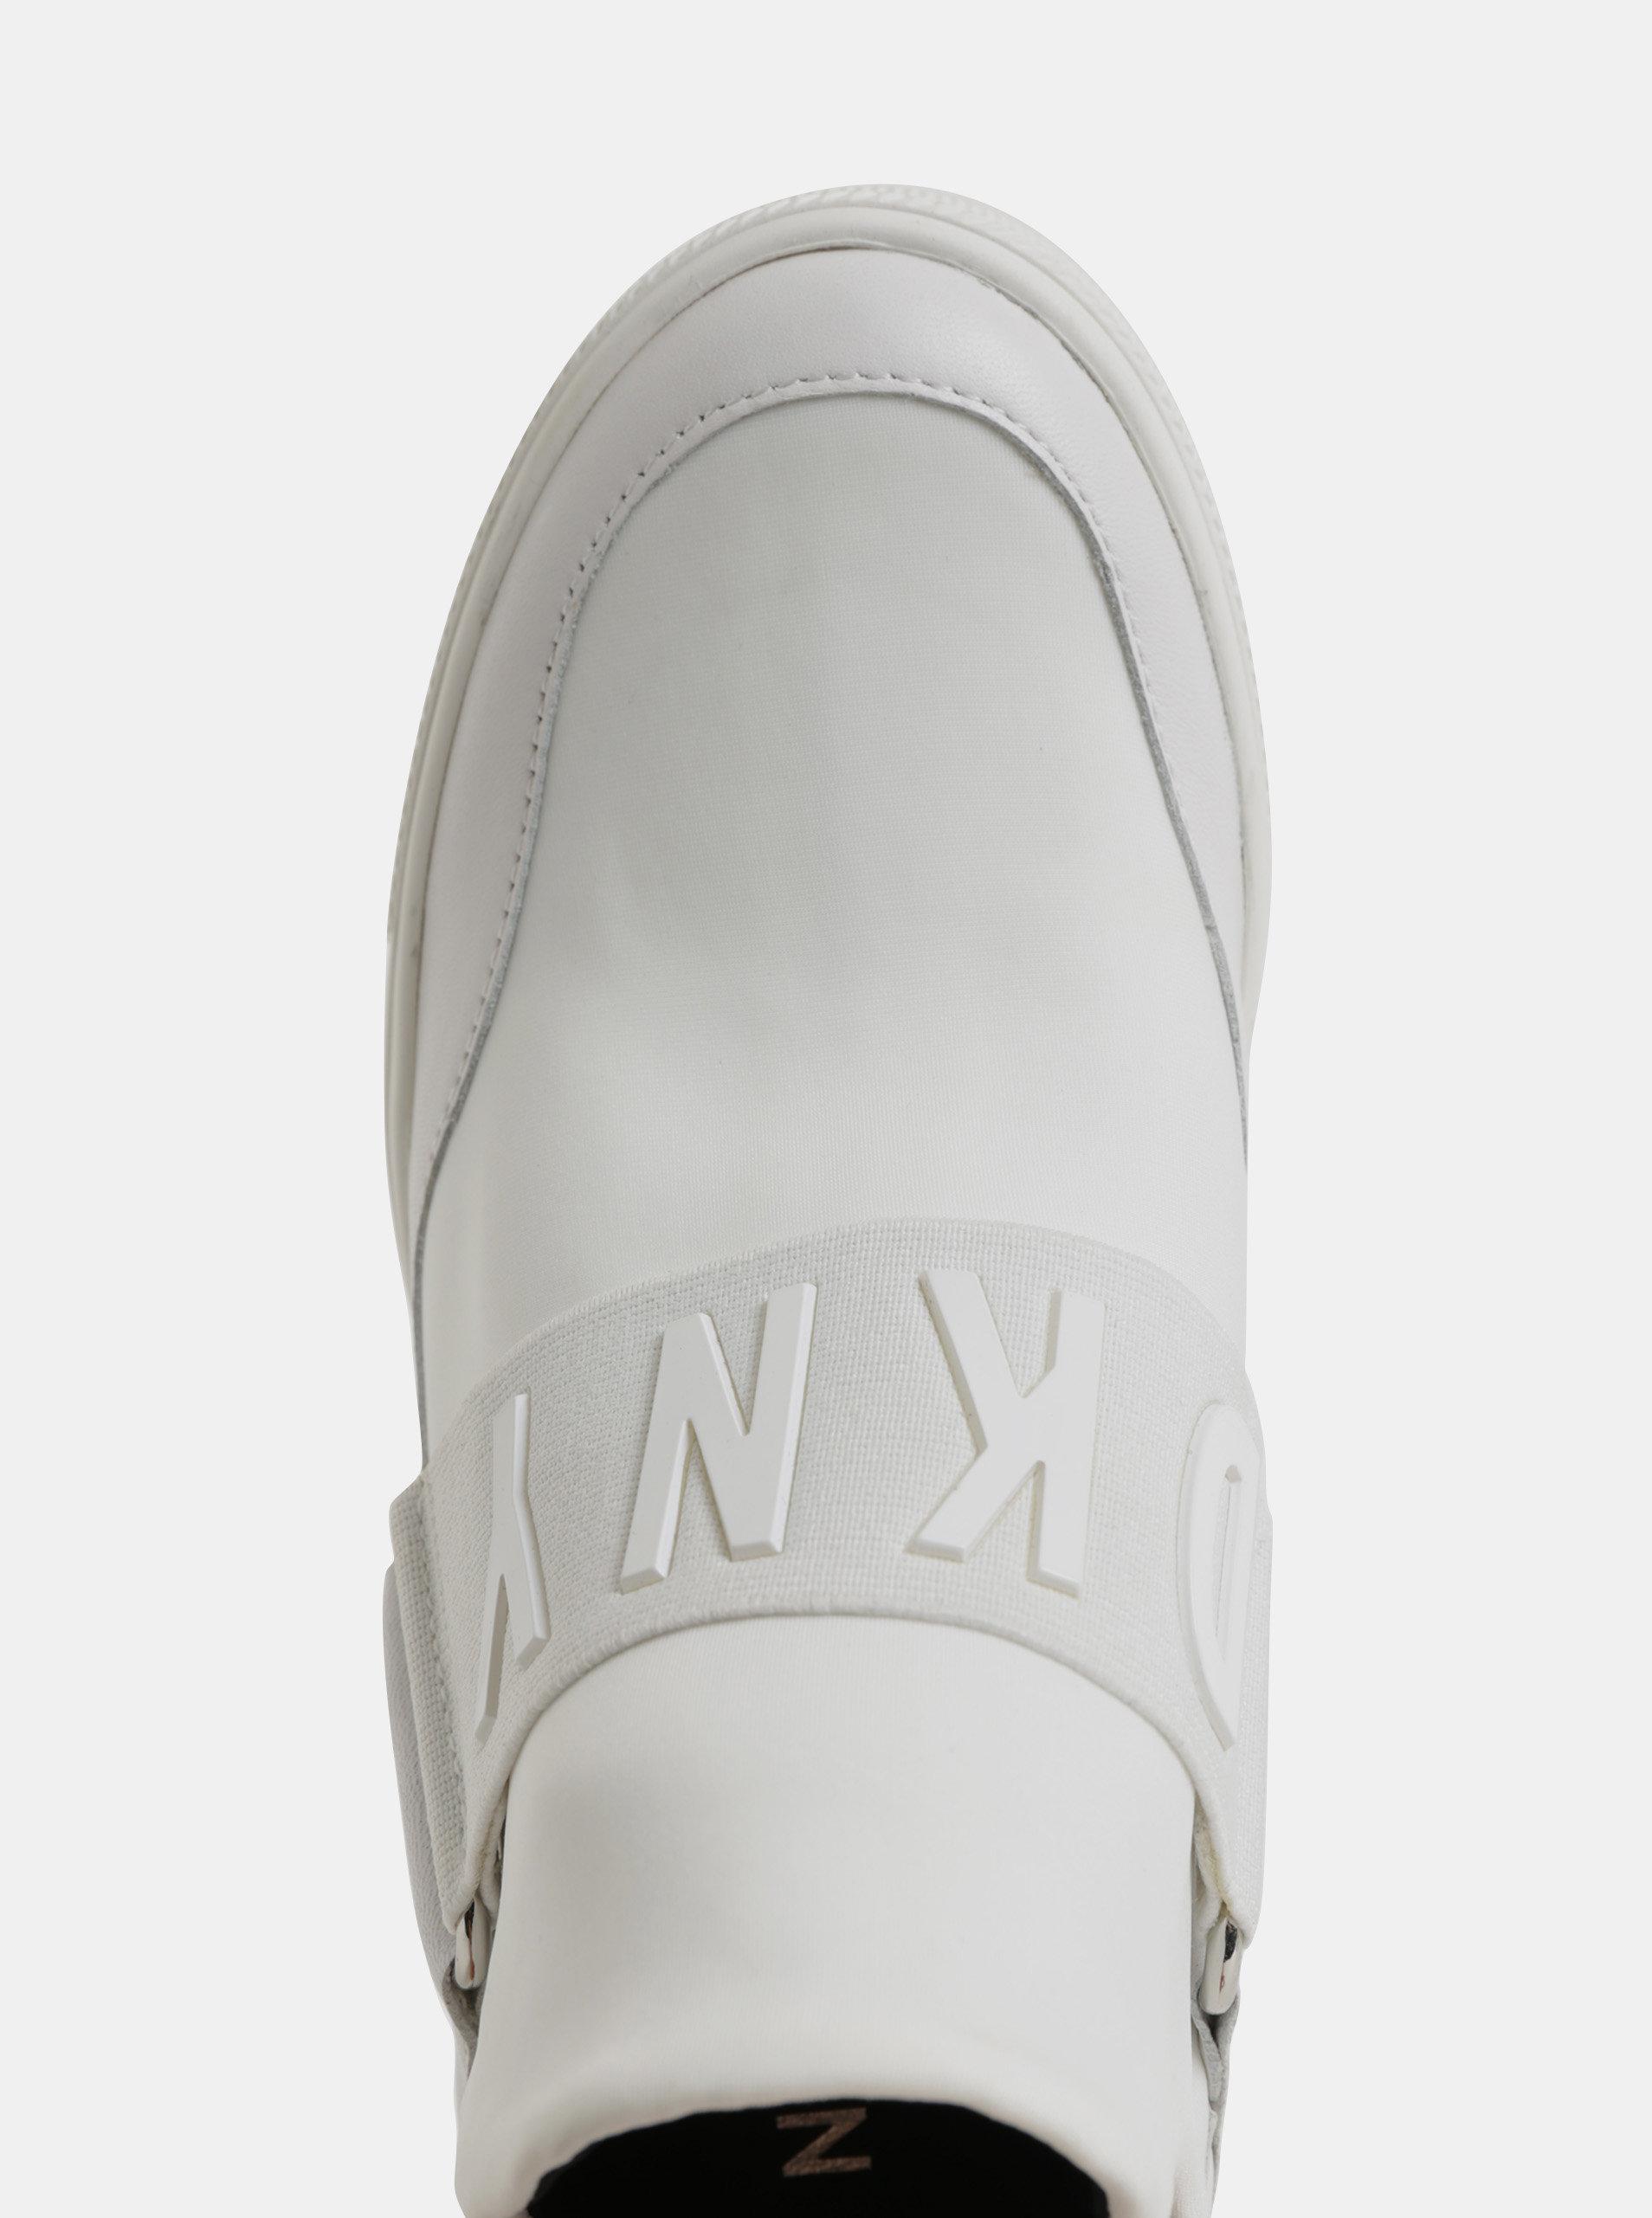 6cf215ef4eb2 Biele tenisky na plnom podpätku DKNY Cosmos ...